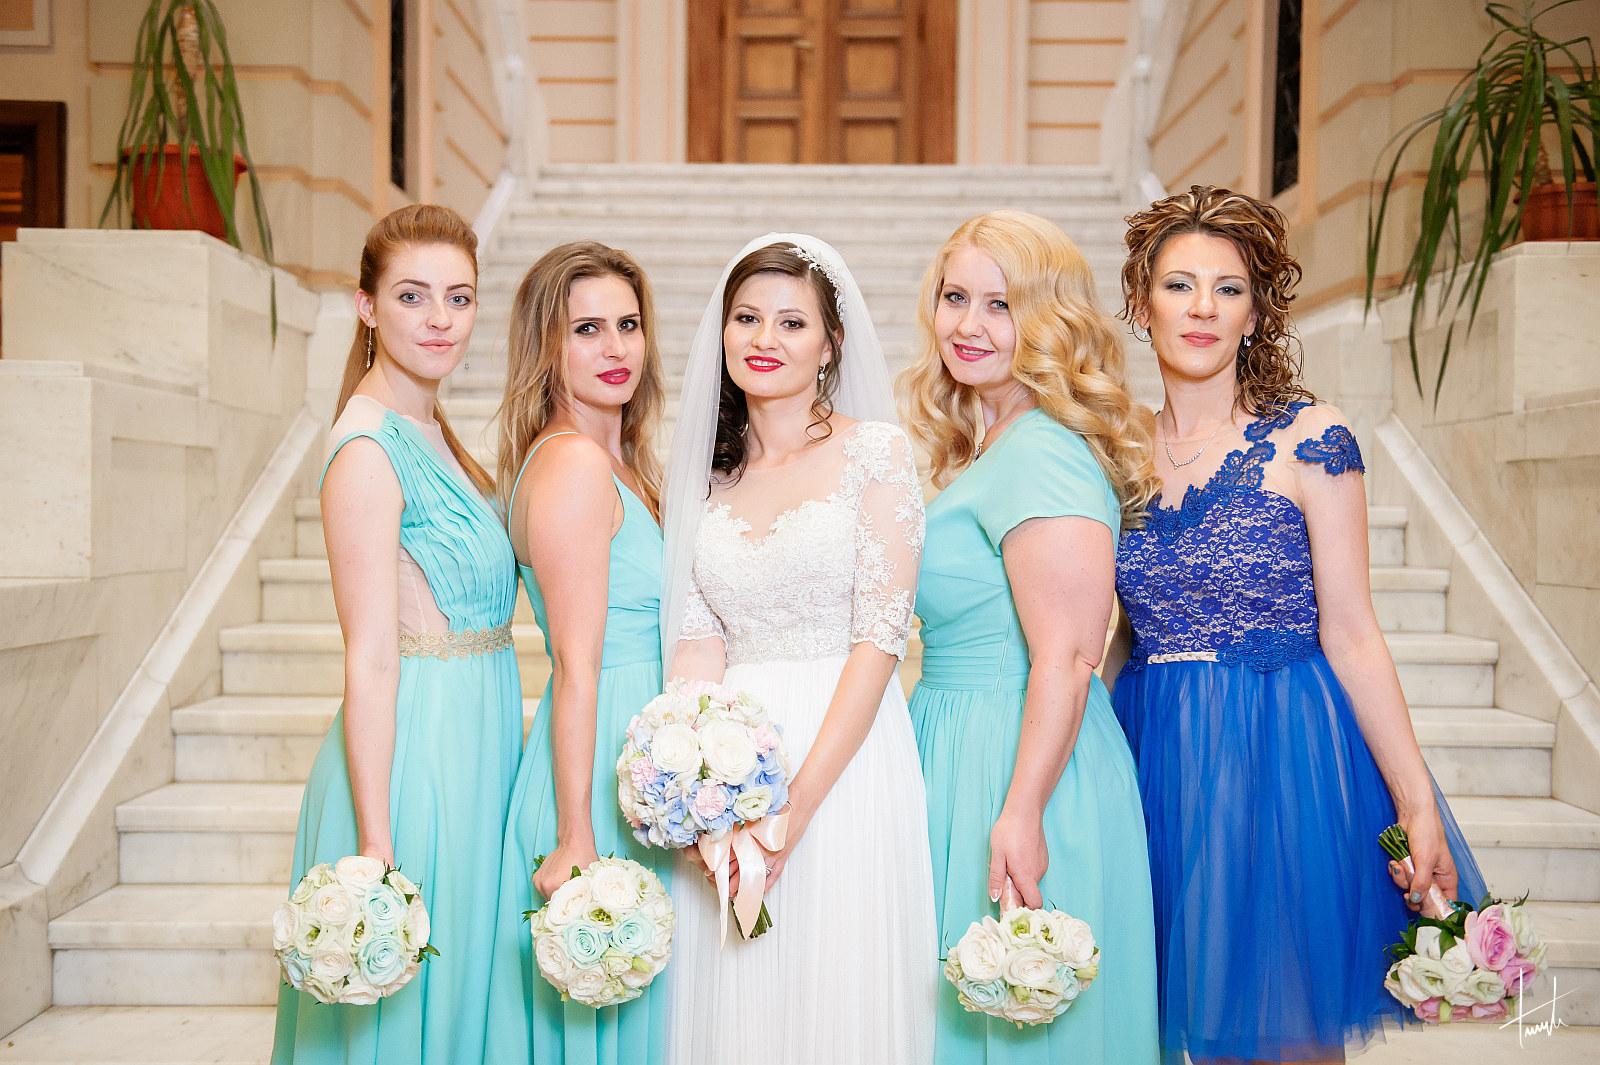 fotograf nunta - Bogdan Terente - Diana Cosmin 08